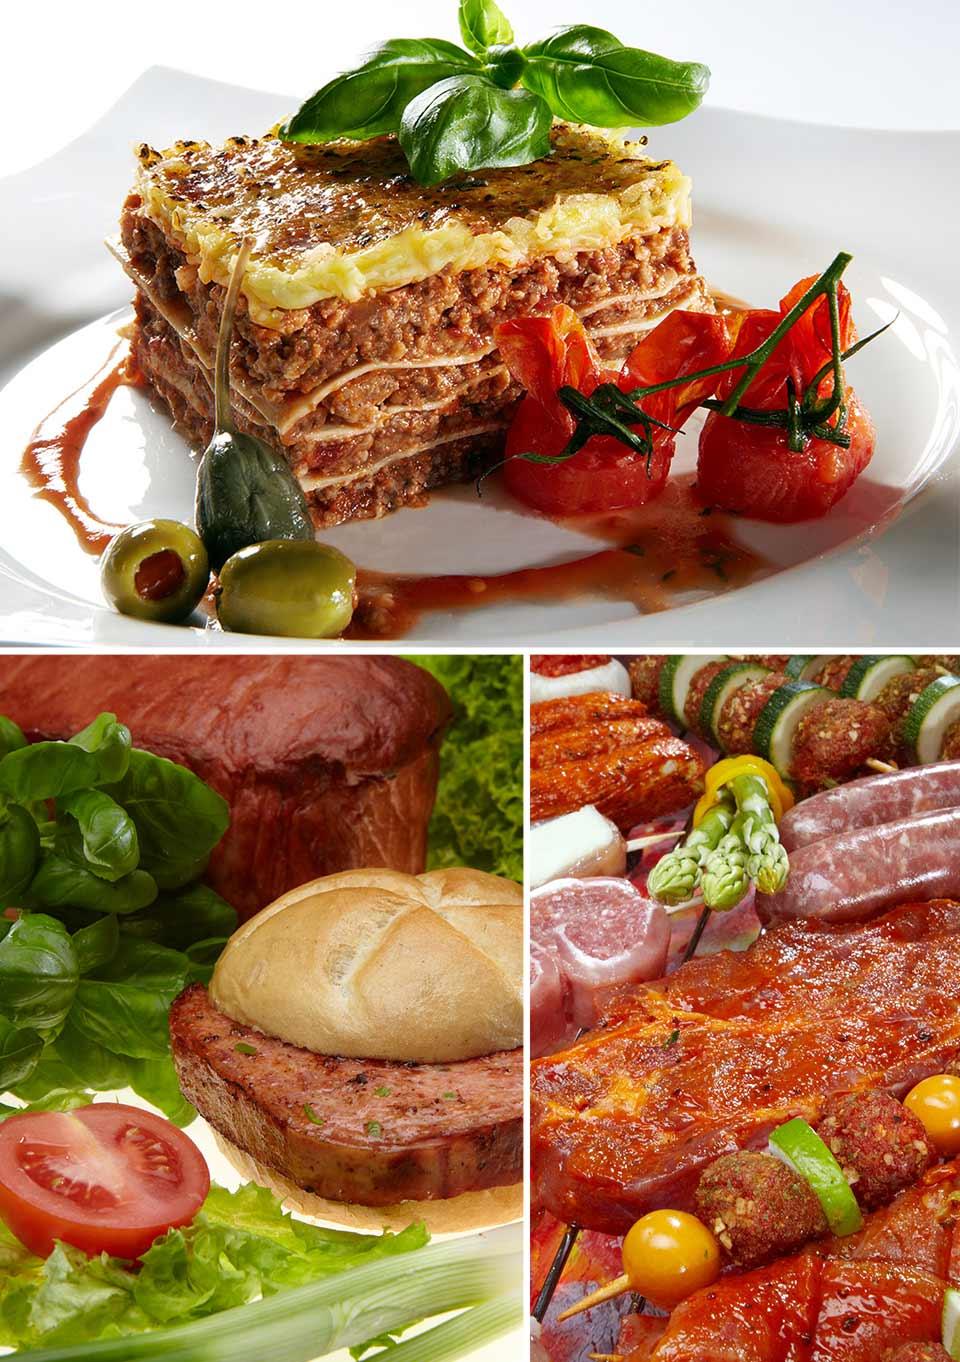 Fooddesign_210x148_